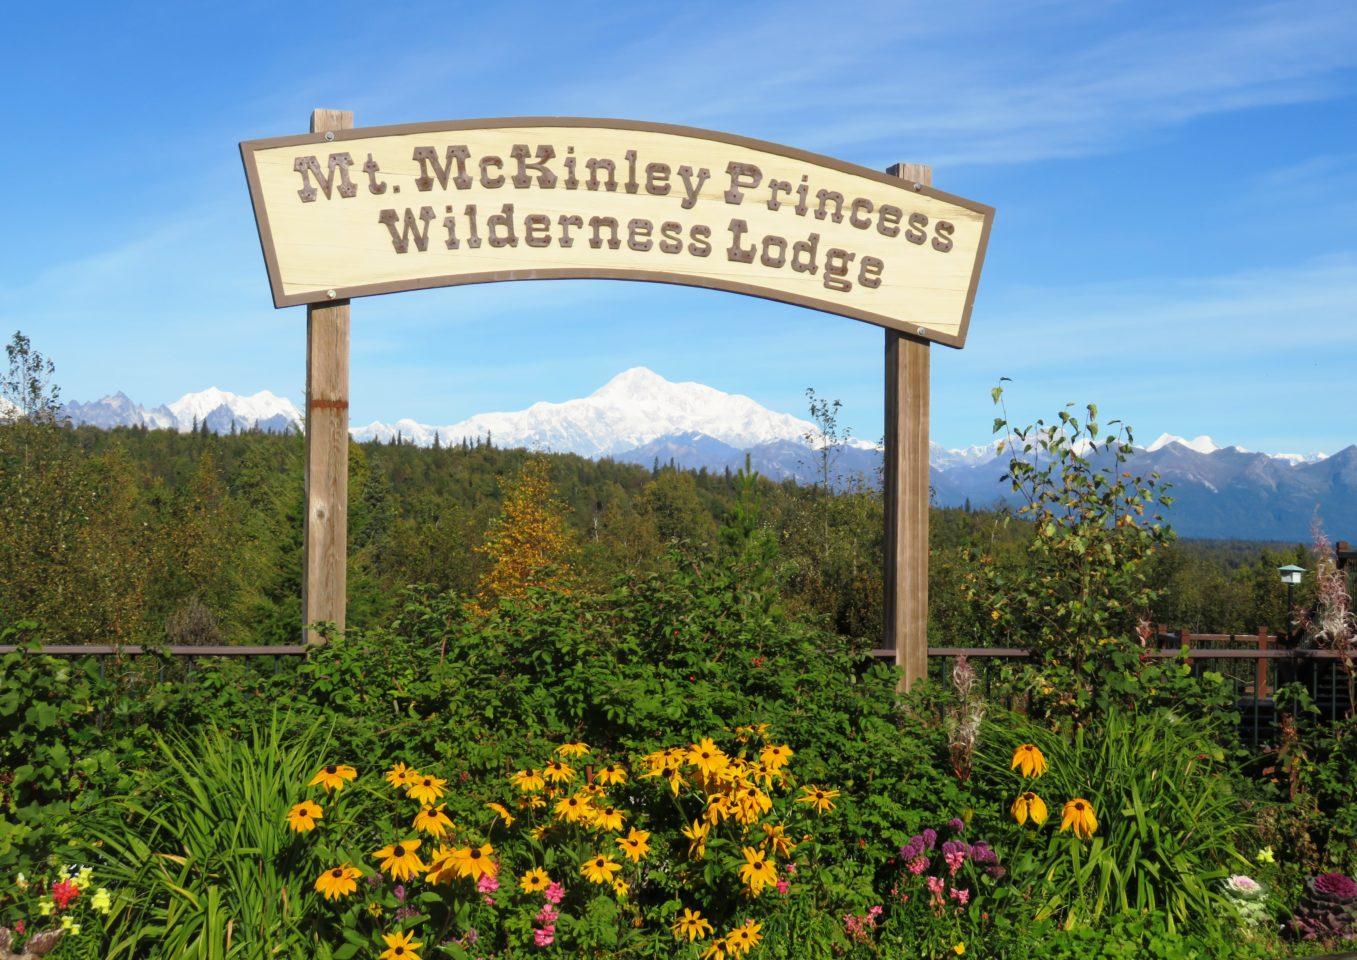 Mount Denali viewed from Mt. McKinley Princess Wilderness Lodge in Alaska